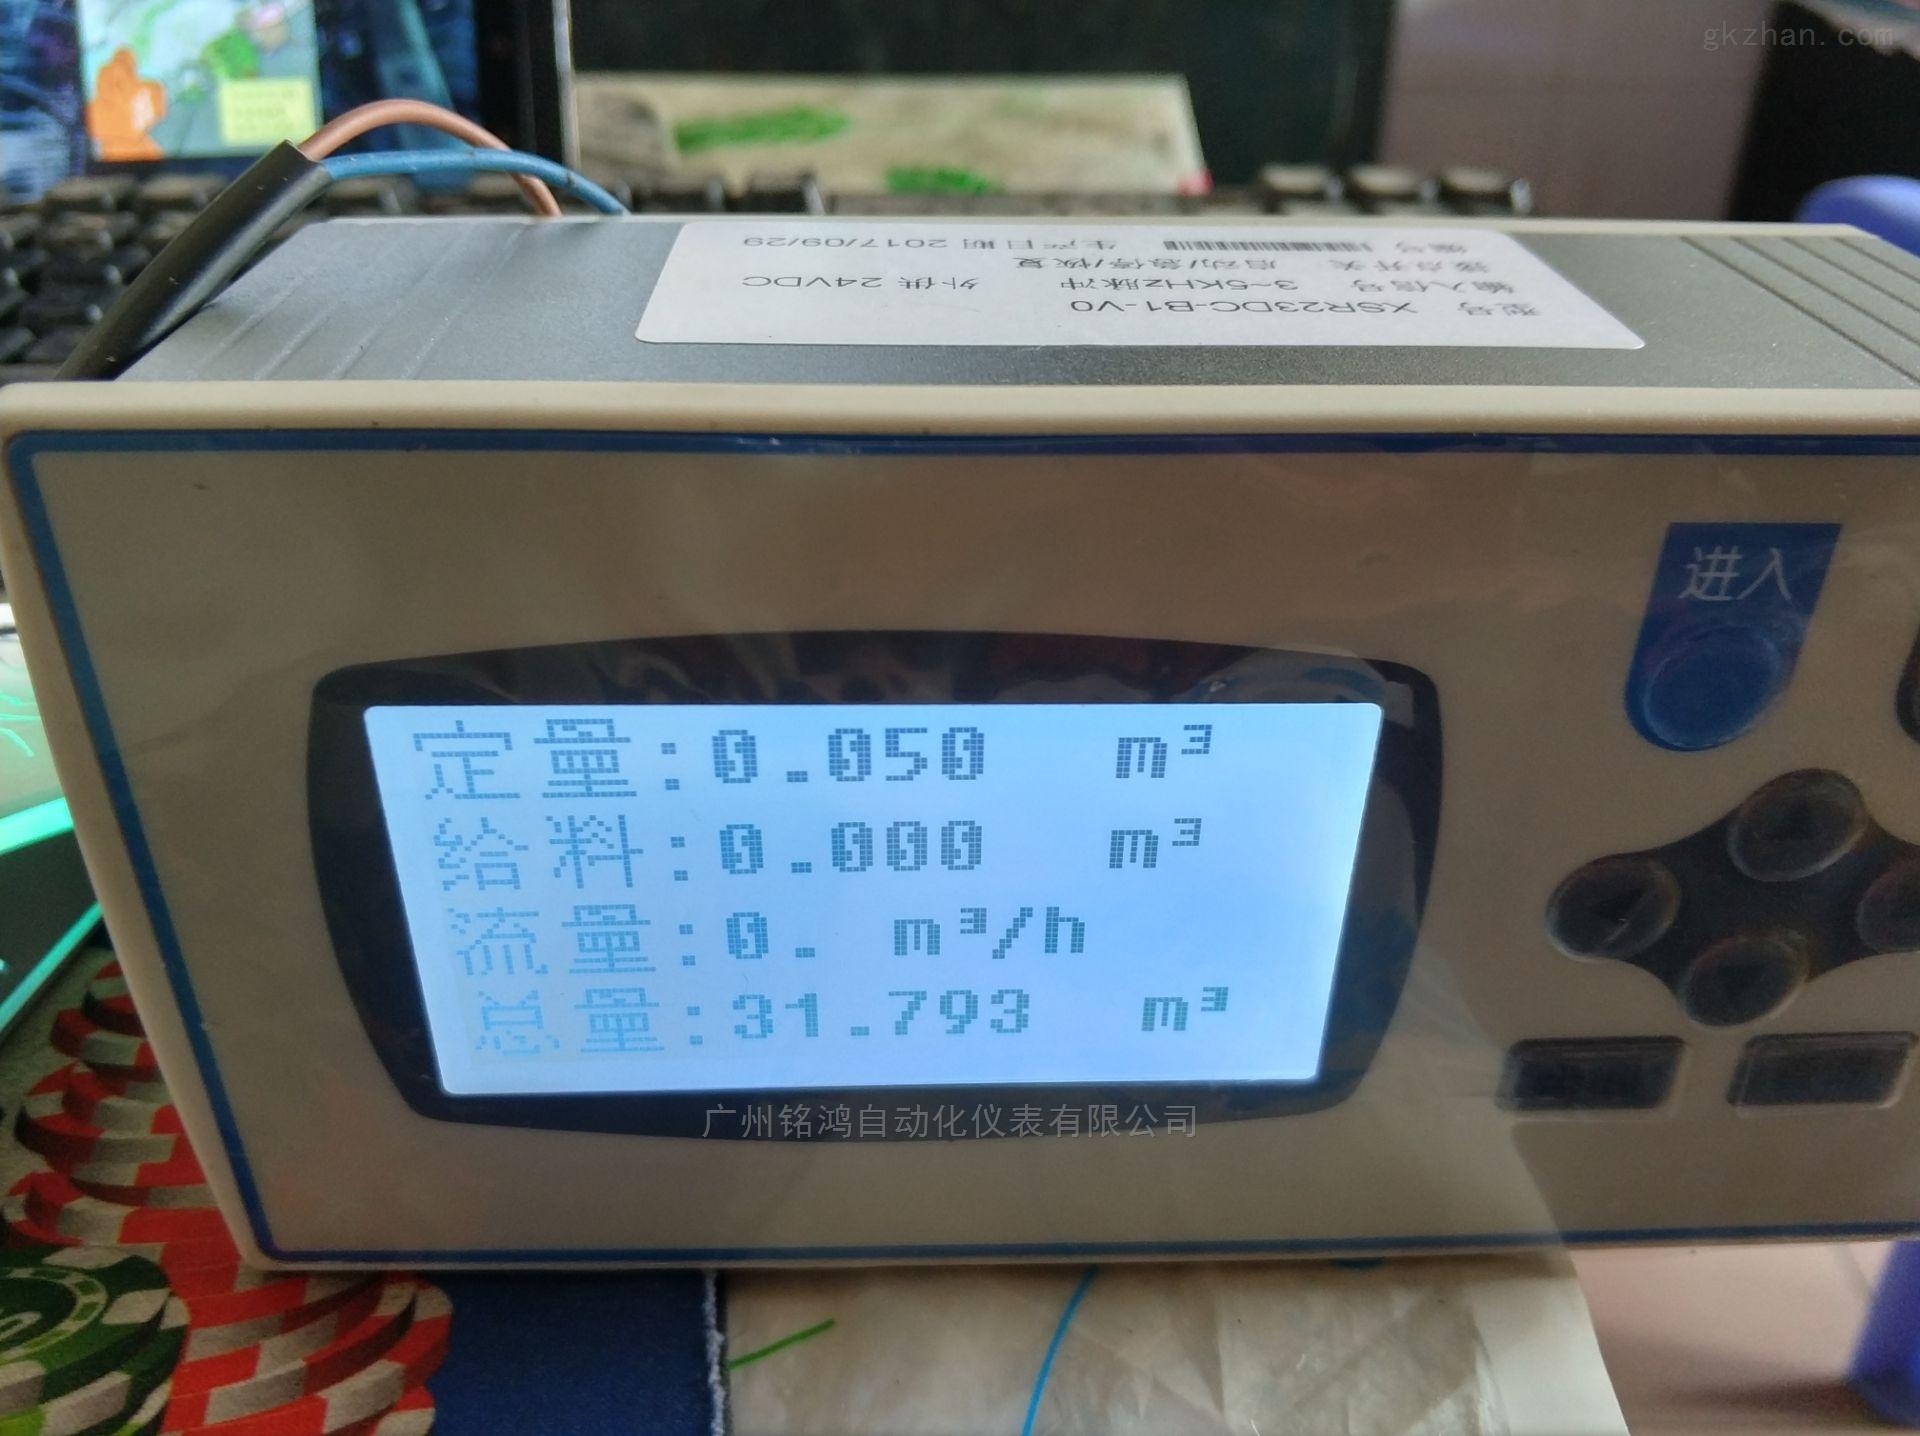 XSR23DC液晶定量控制仪配涡轮微型流量计